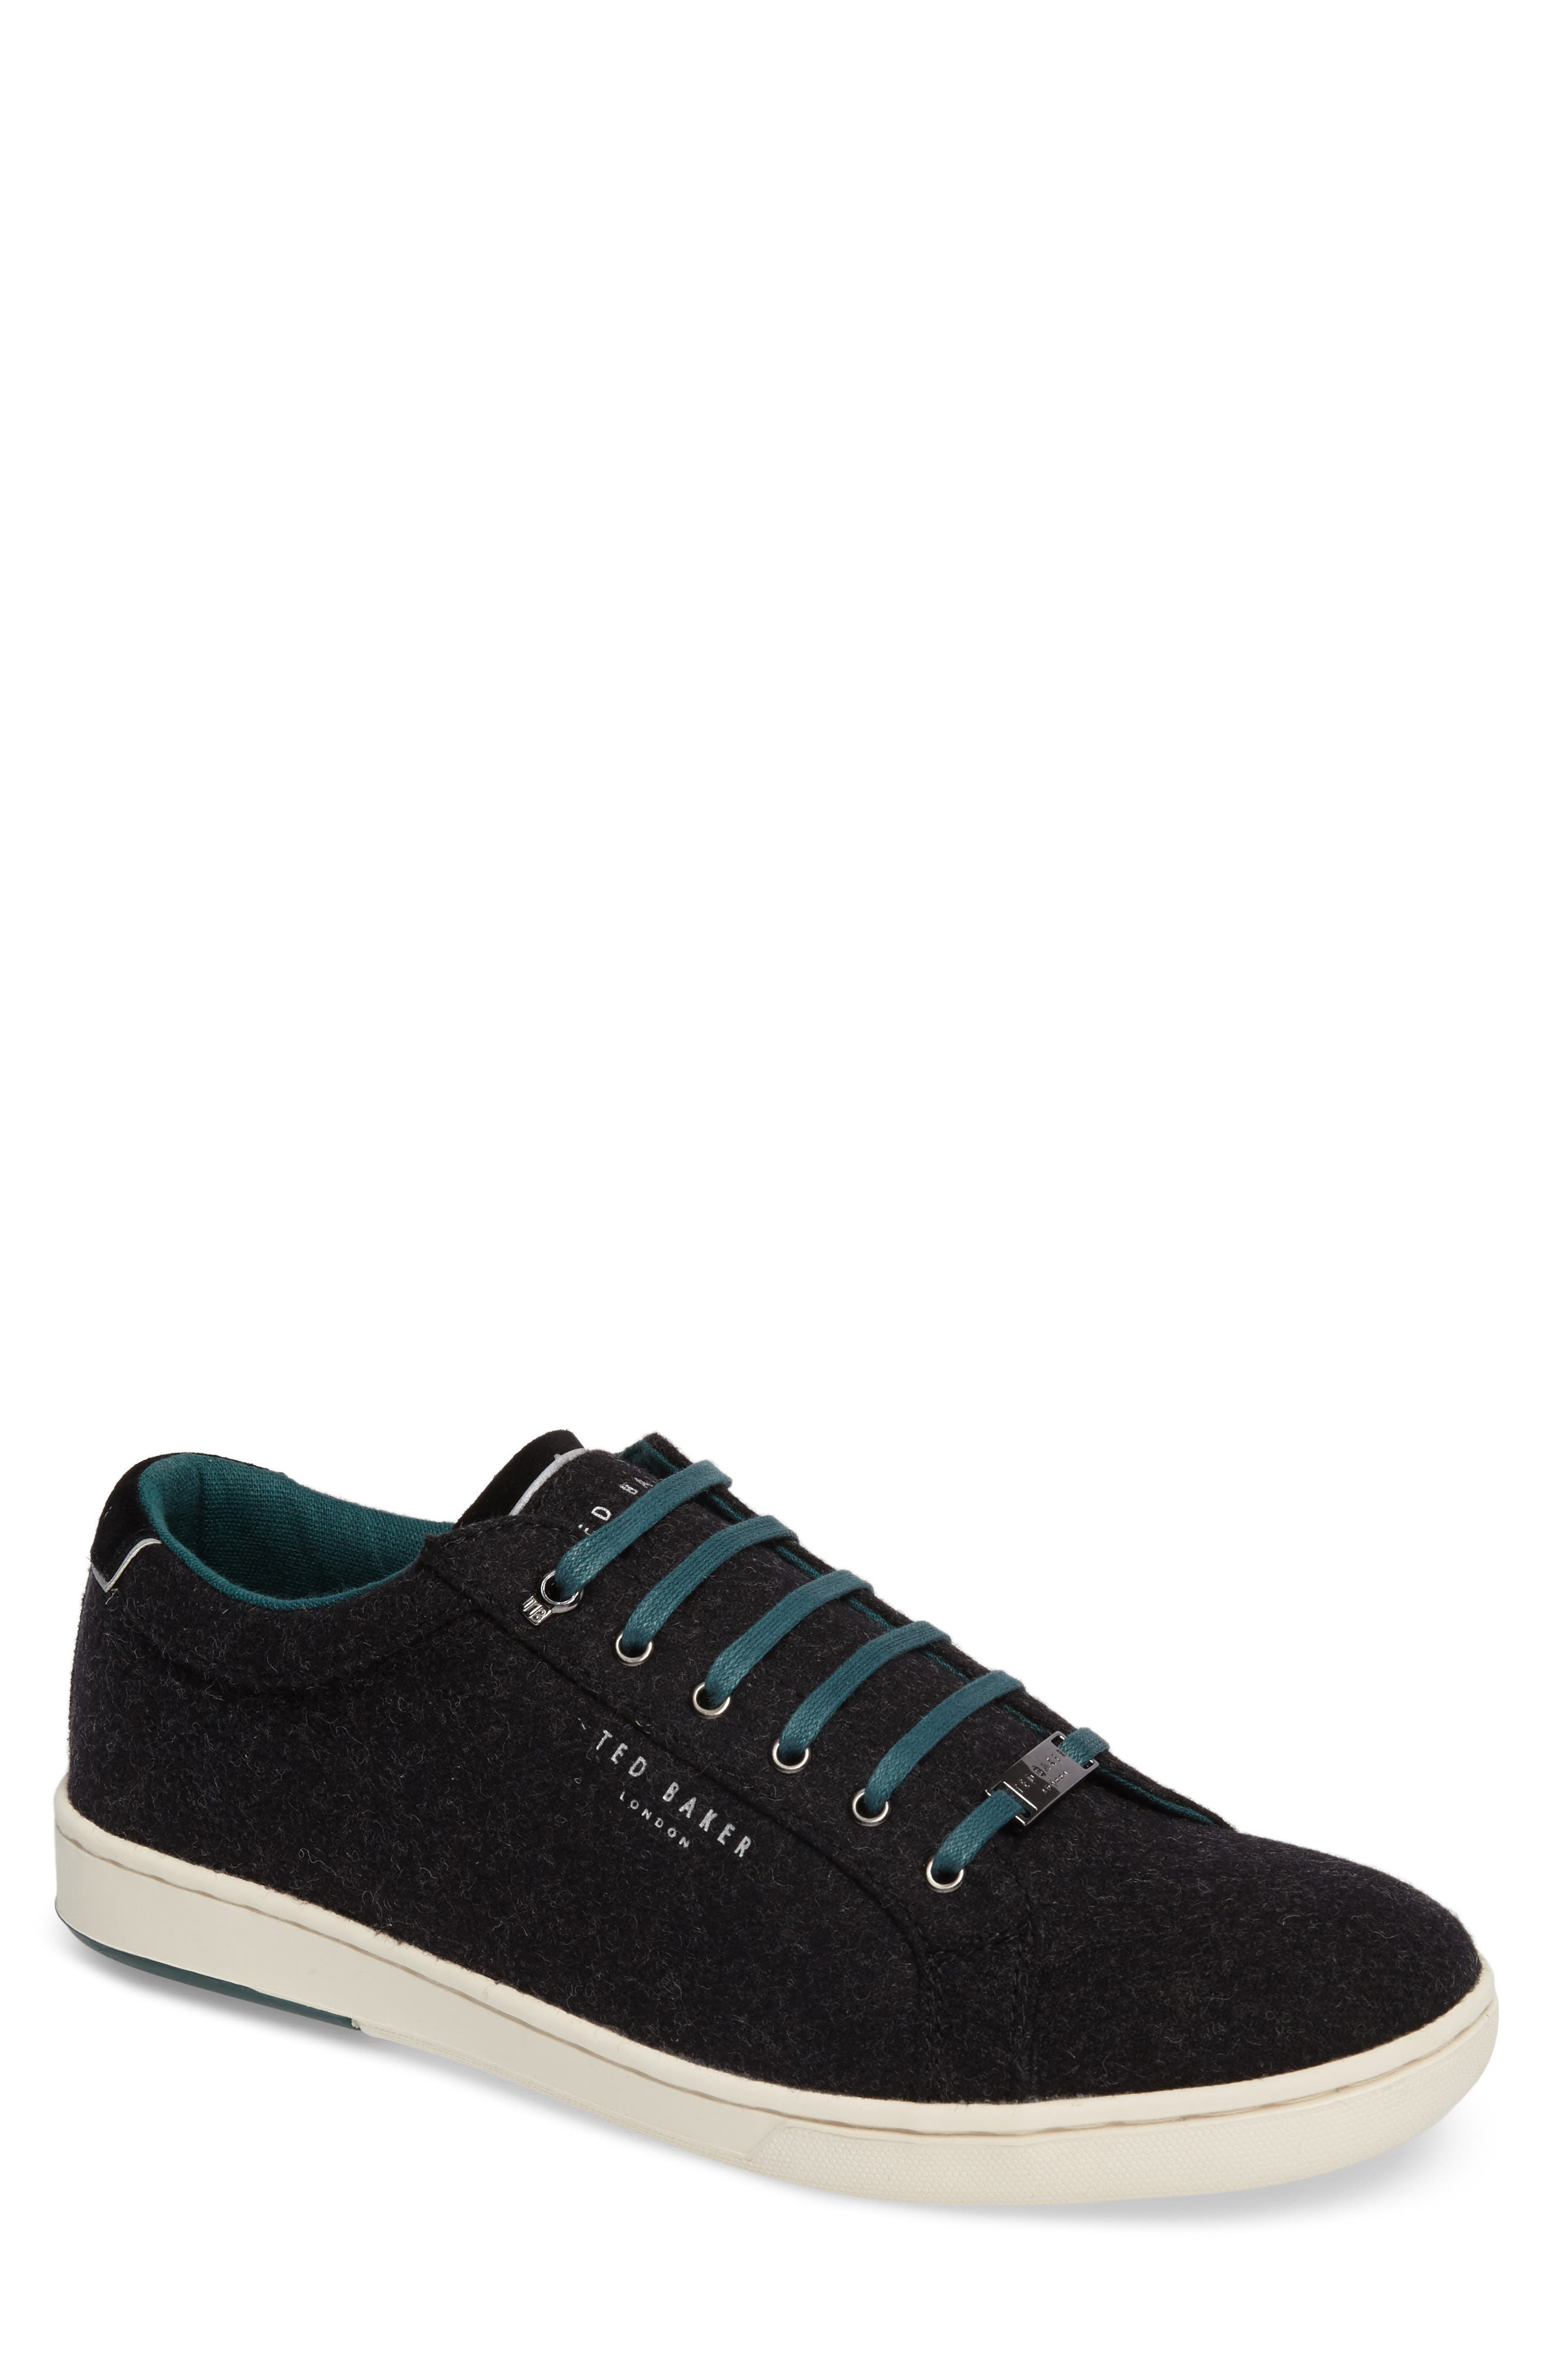 Minem 3 Sneaker,                             Main thumbnail 1, color,                             Black Wool